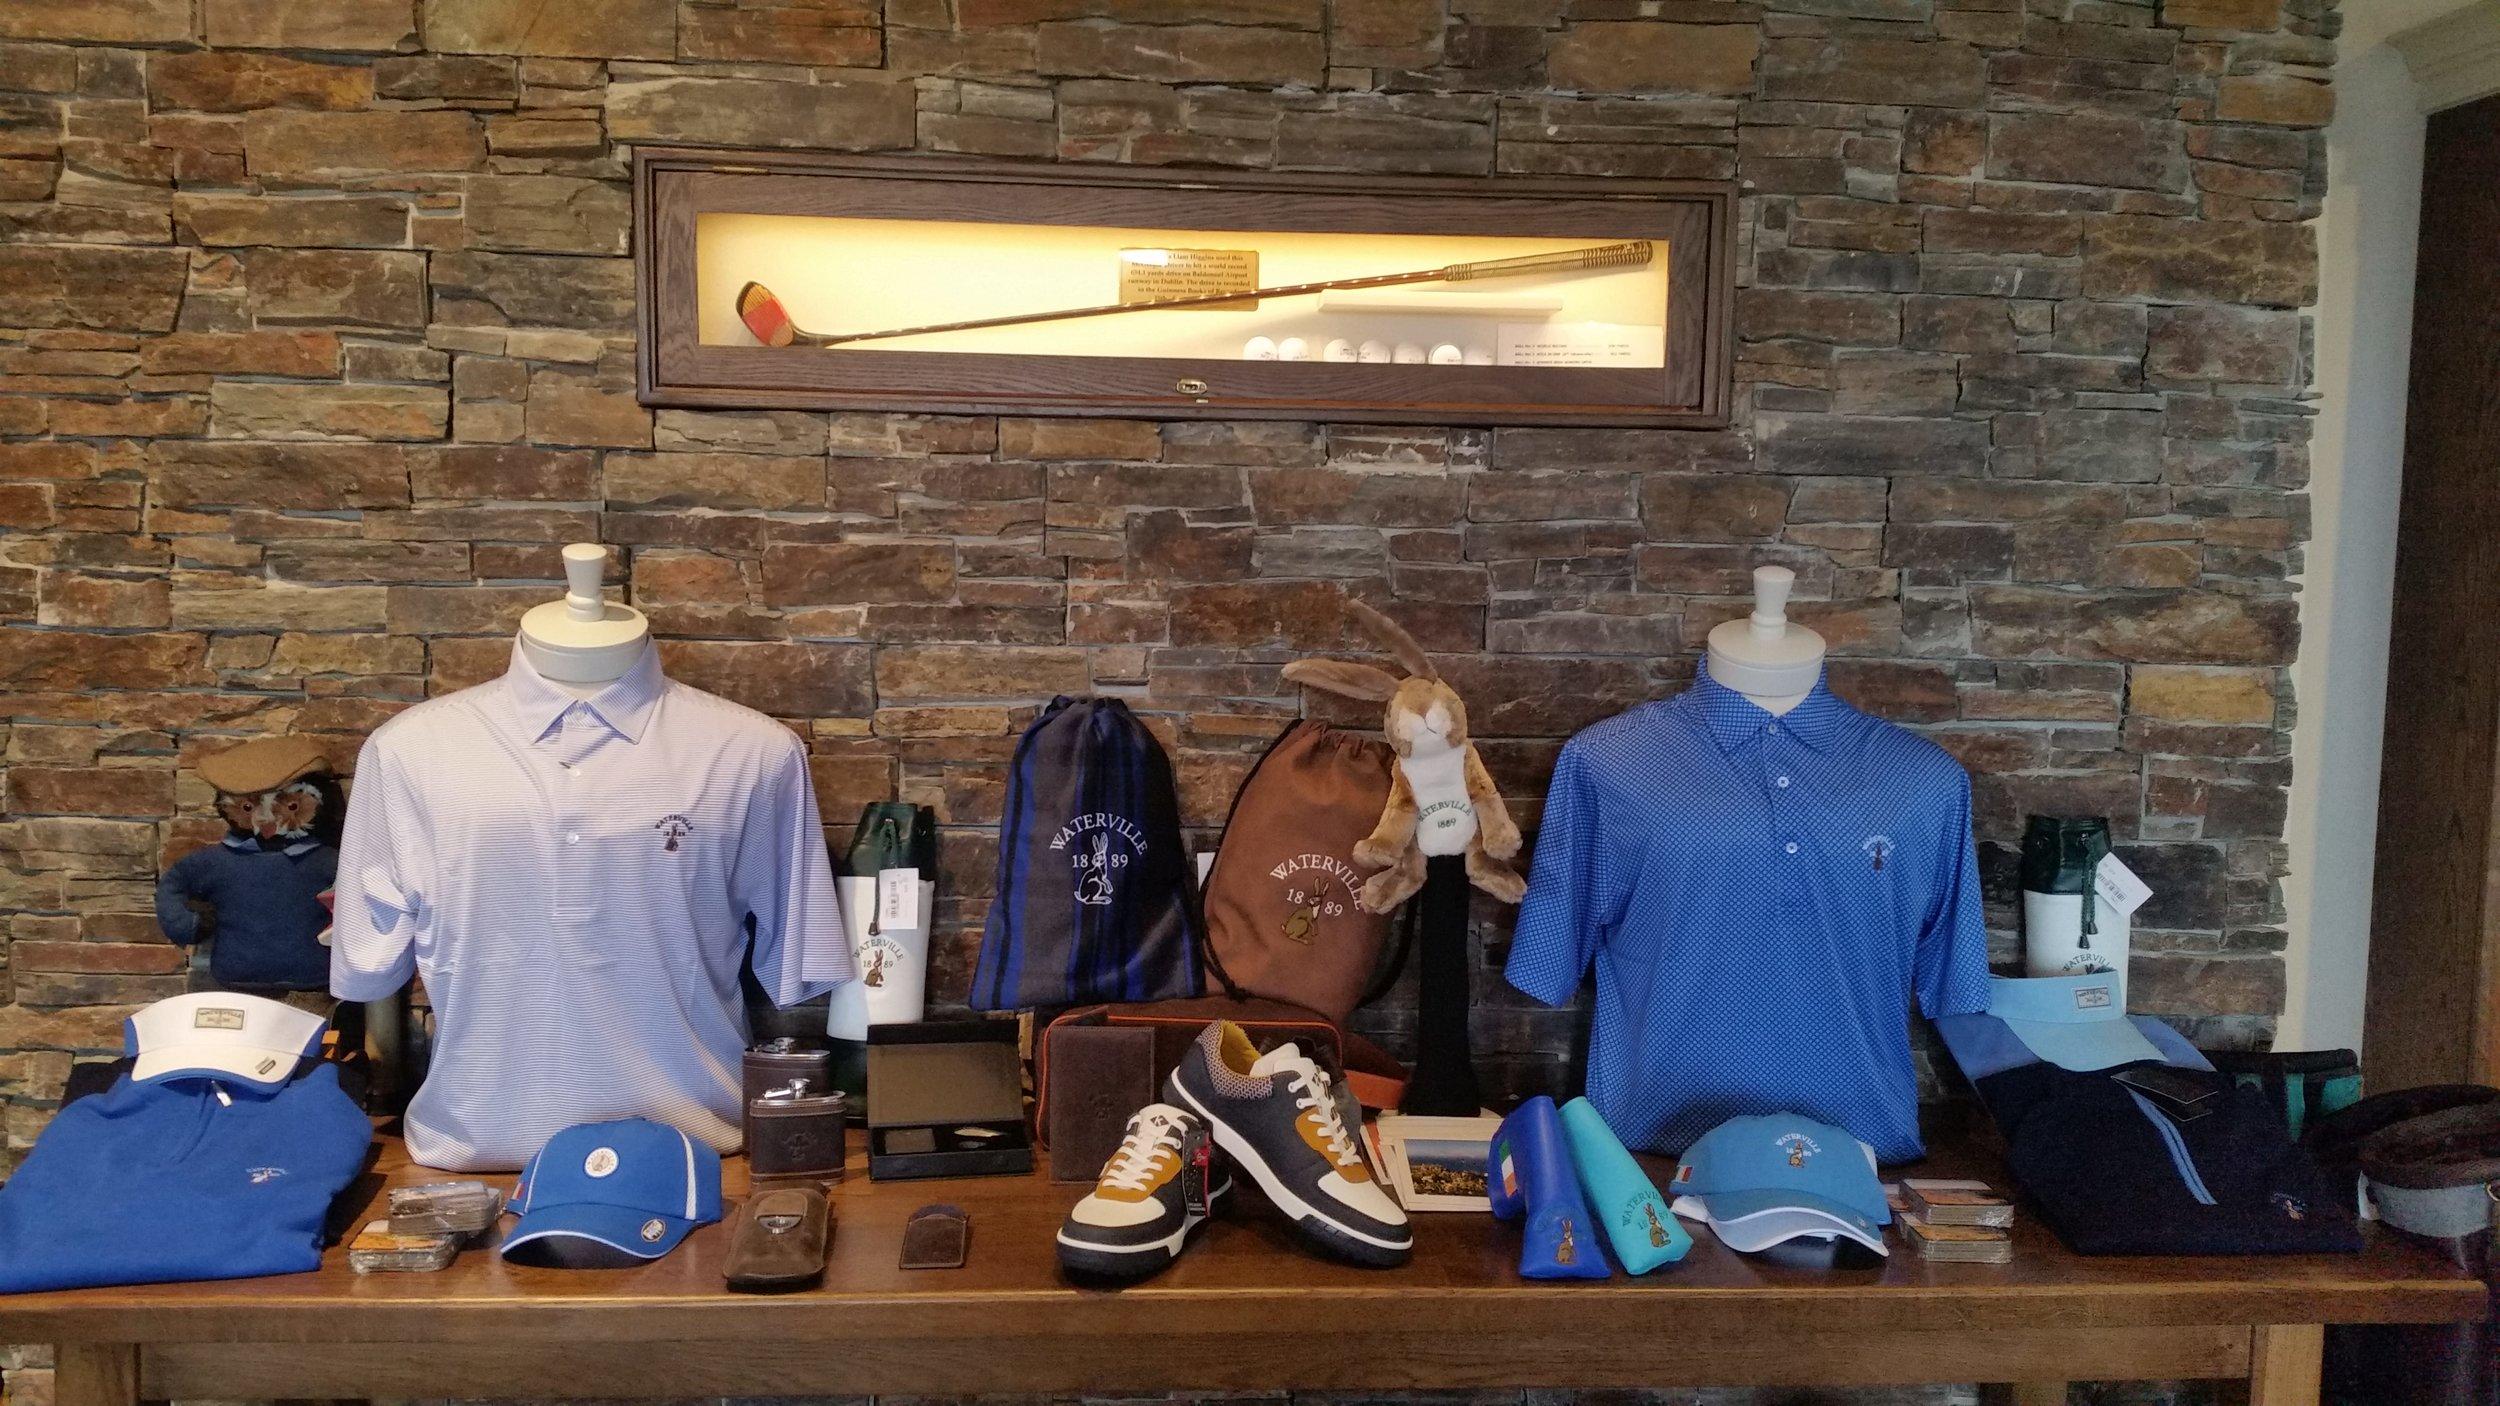 Golf Shop Display 2018.jpg